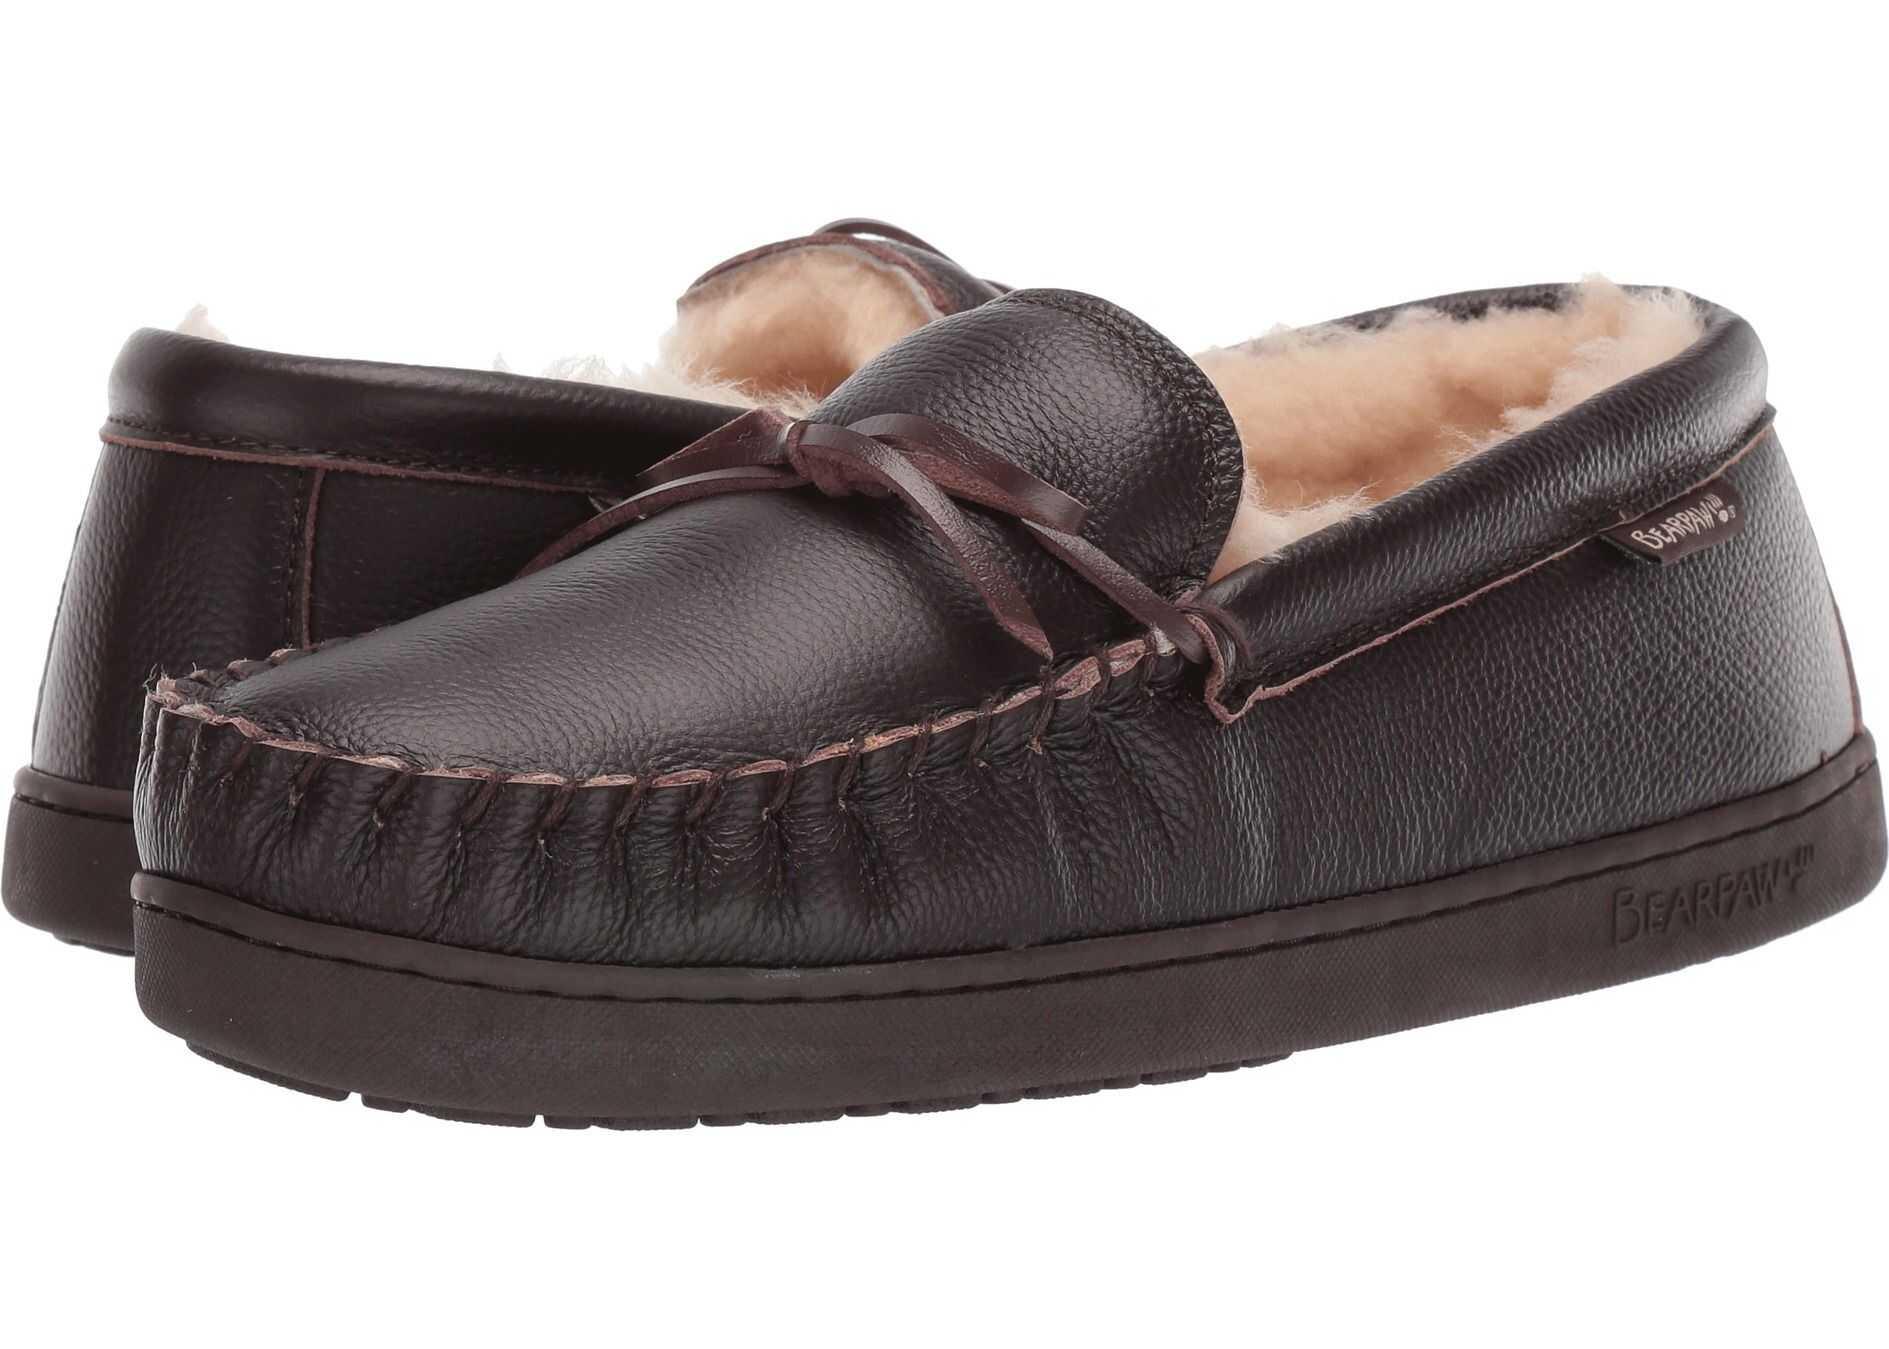 Bearpaw Mach IV Chocolate Leather